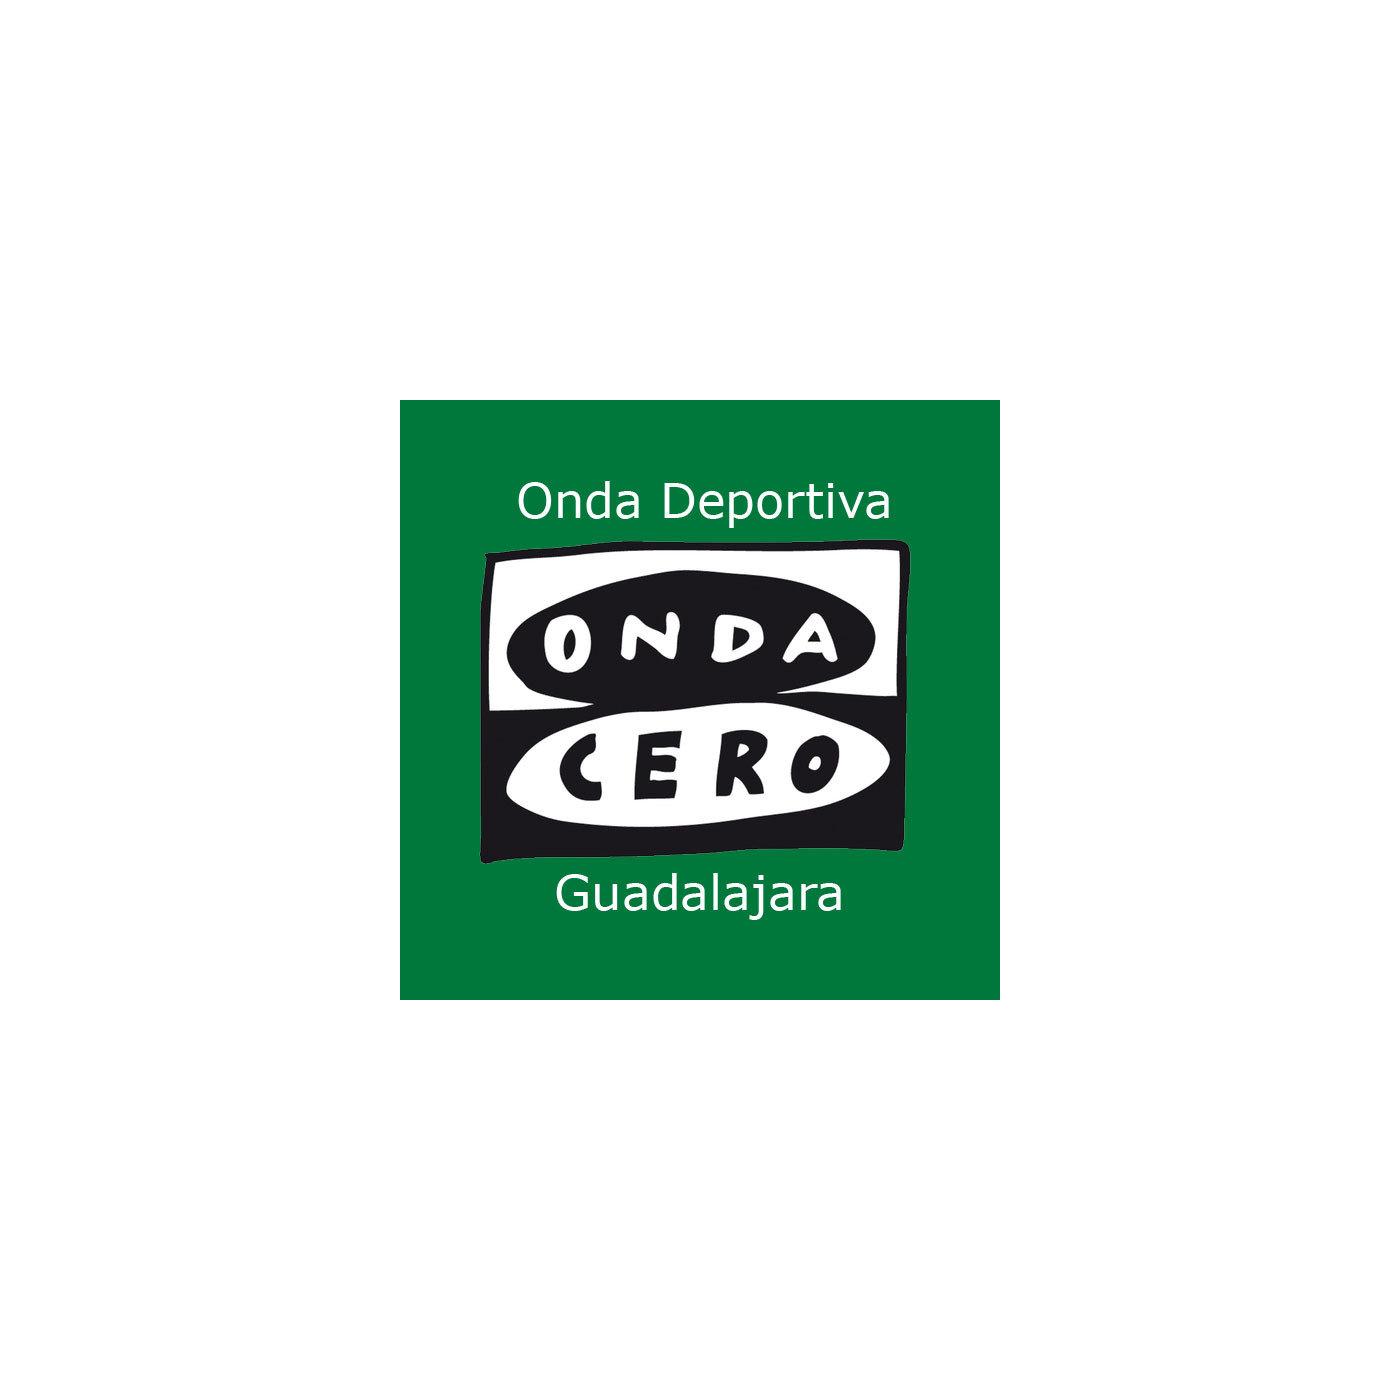 <![CDATA[Onda Deportiva Guadalajara]]>